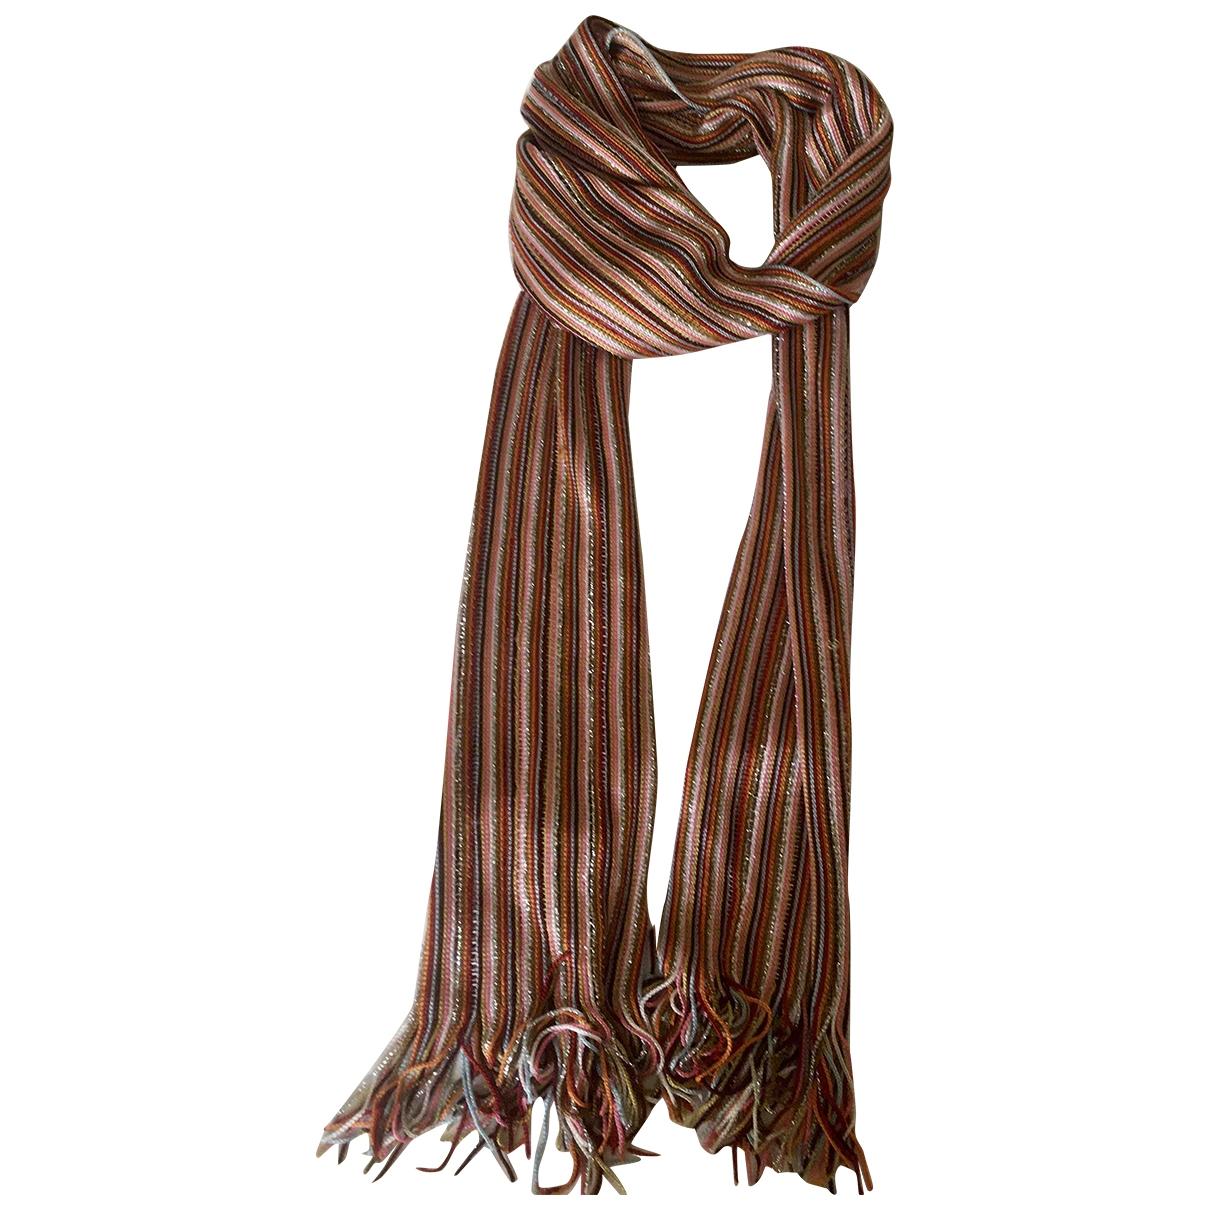 M Missoni \N Multicolour scarf for Women \N